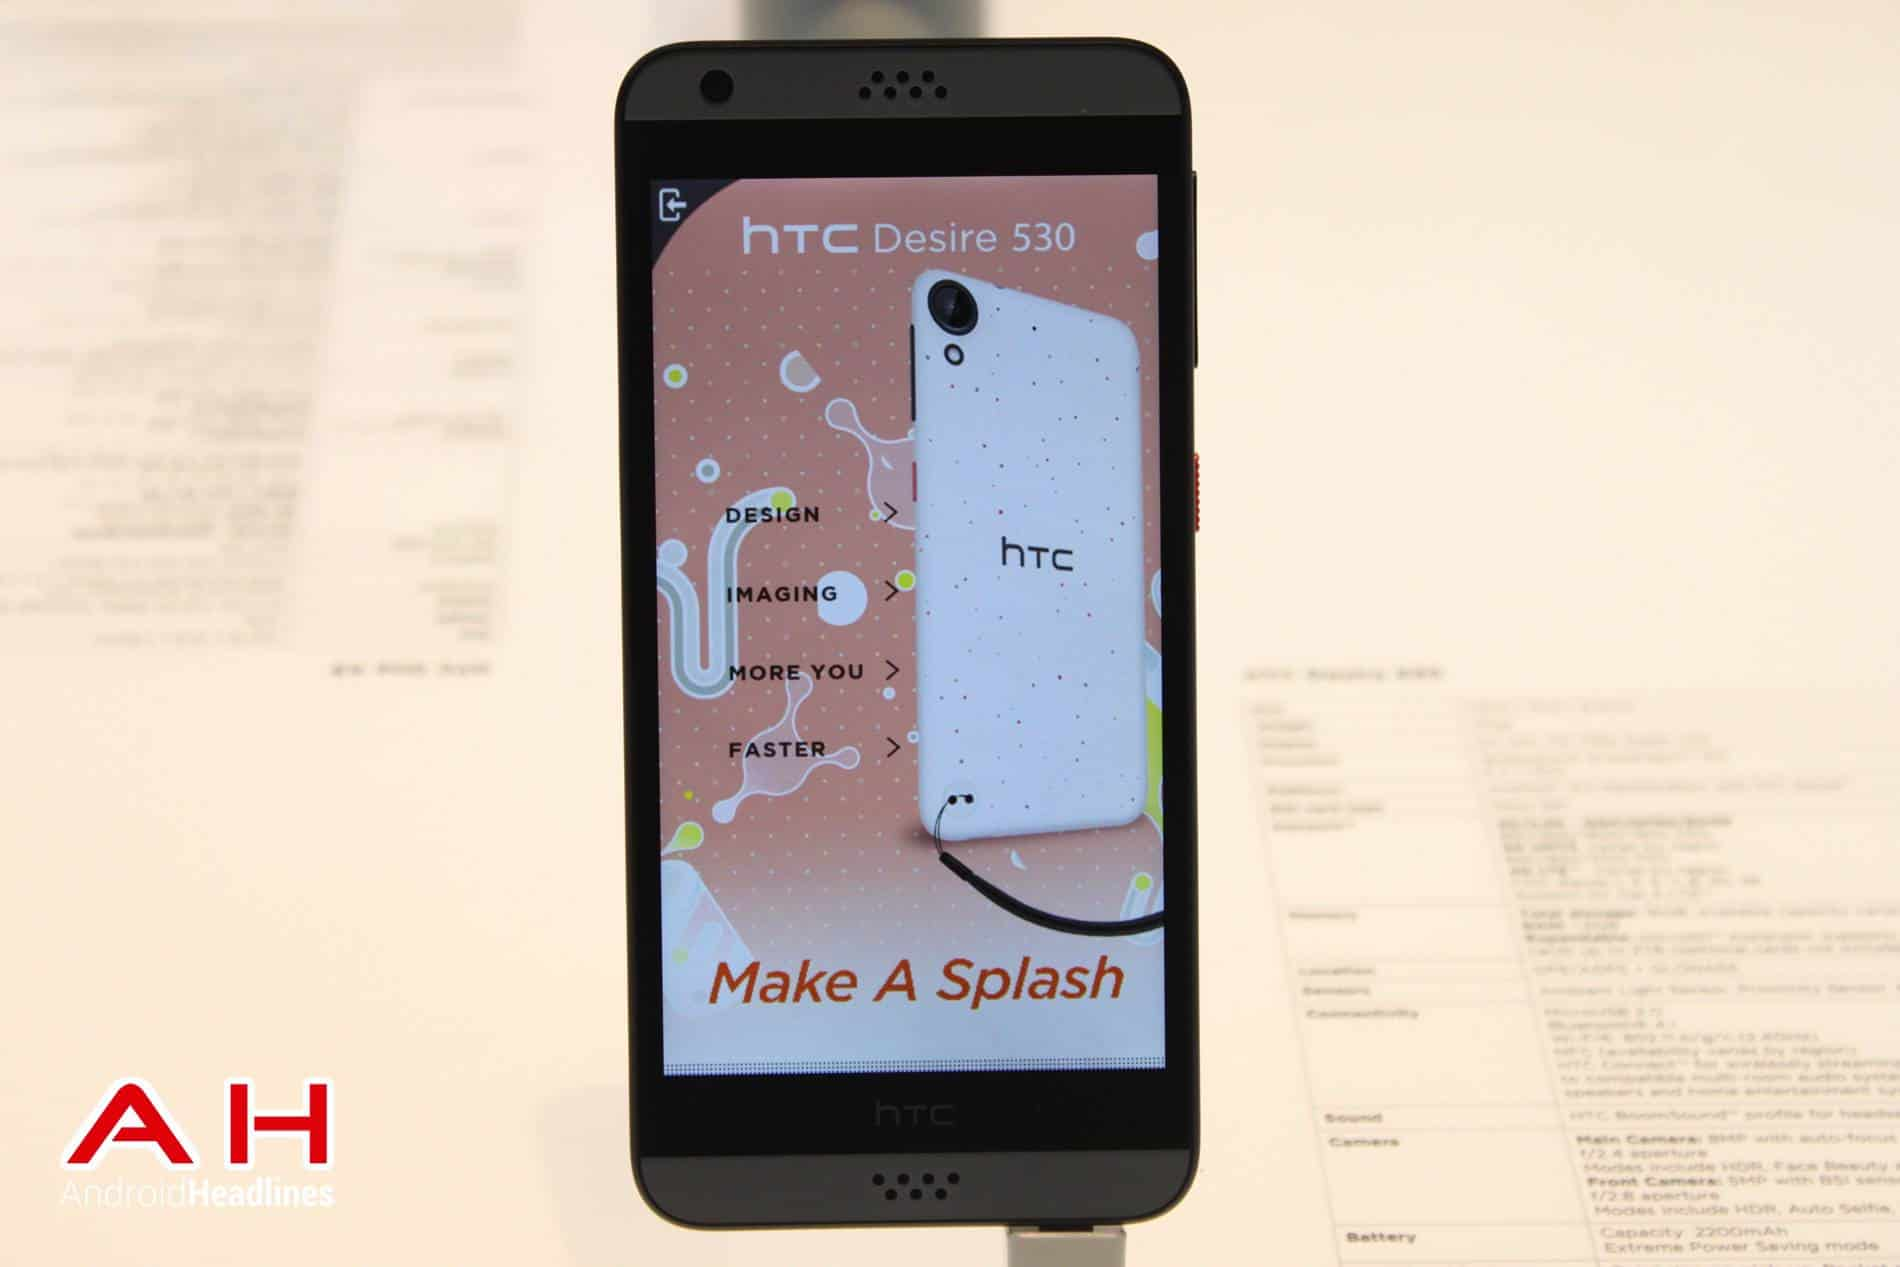 HTC Desire 530 MWC AH 13